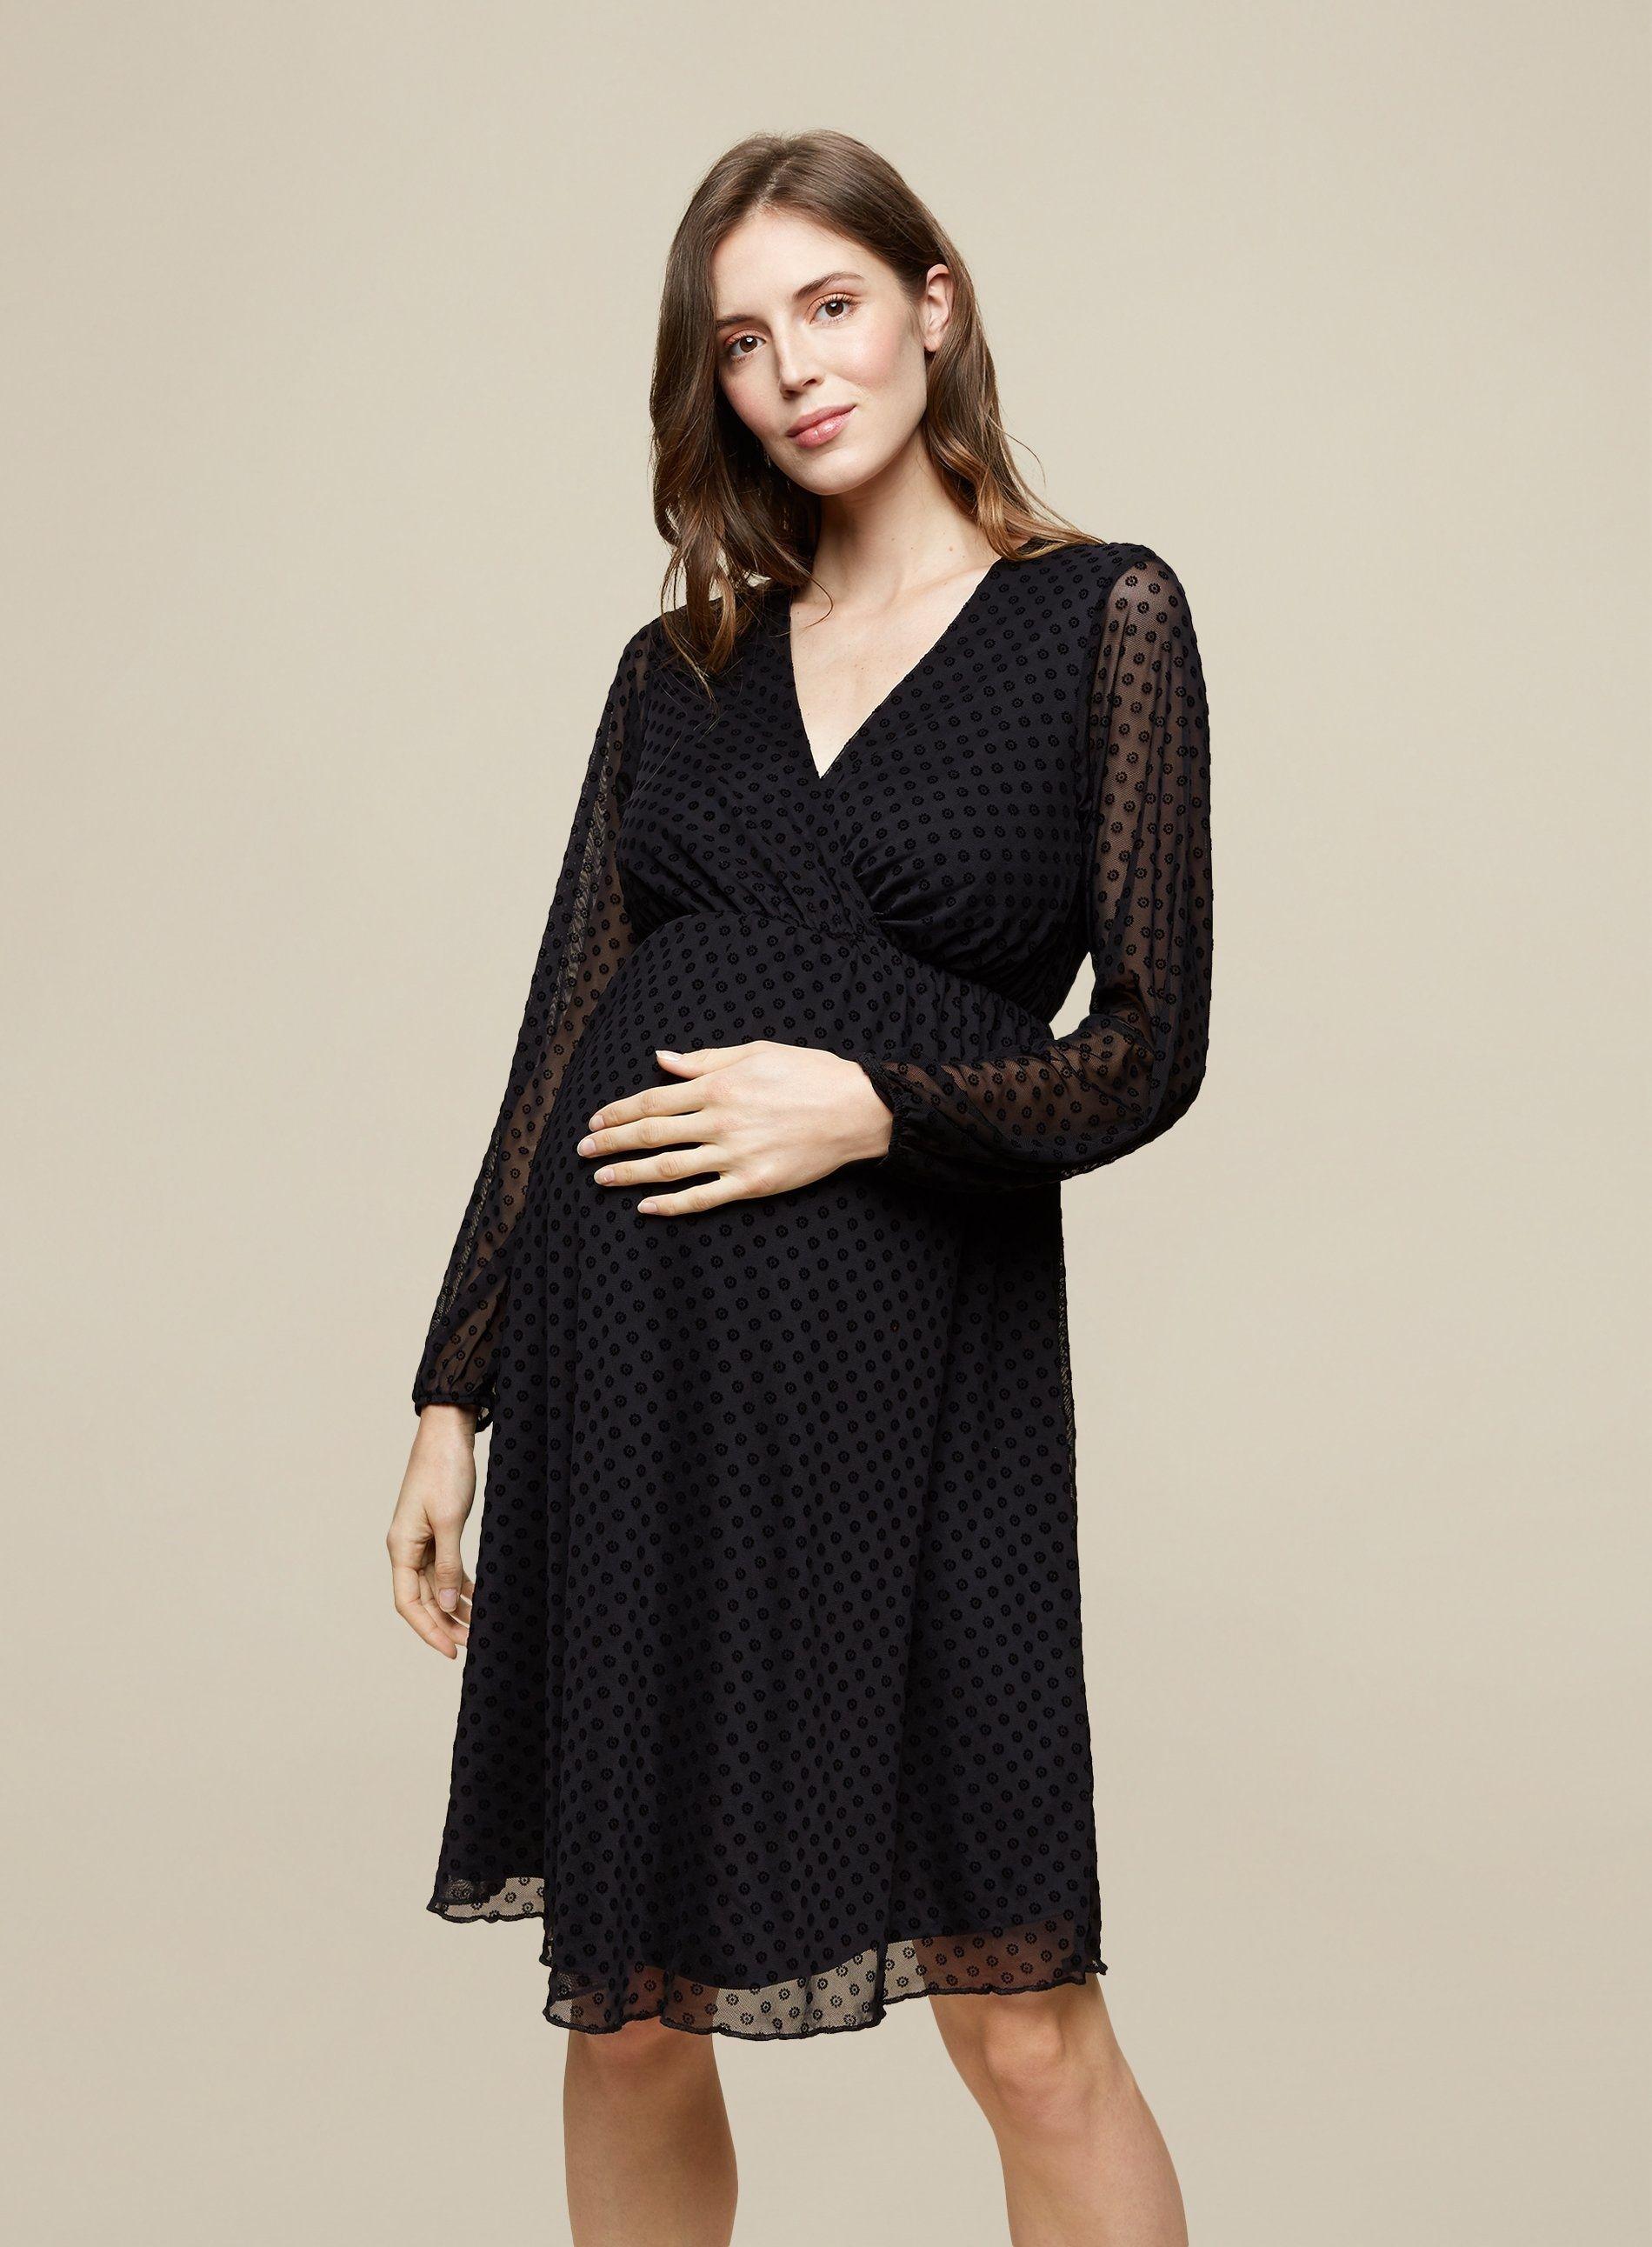 Dorothy Perkins Womens Maternity Black Mesh Wrap Dobby Dress Long Sleeve